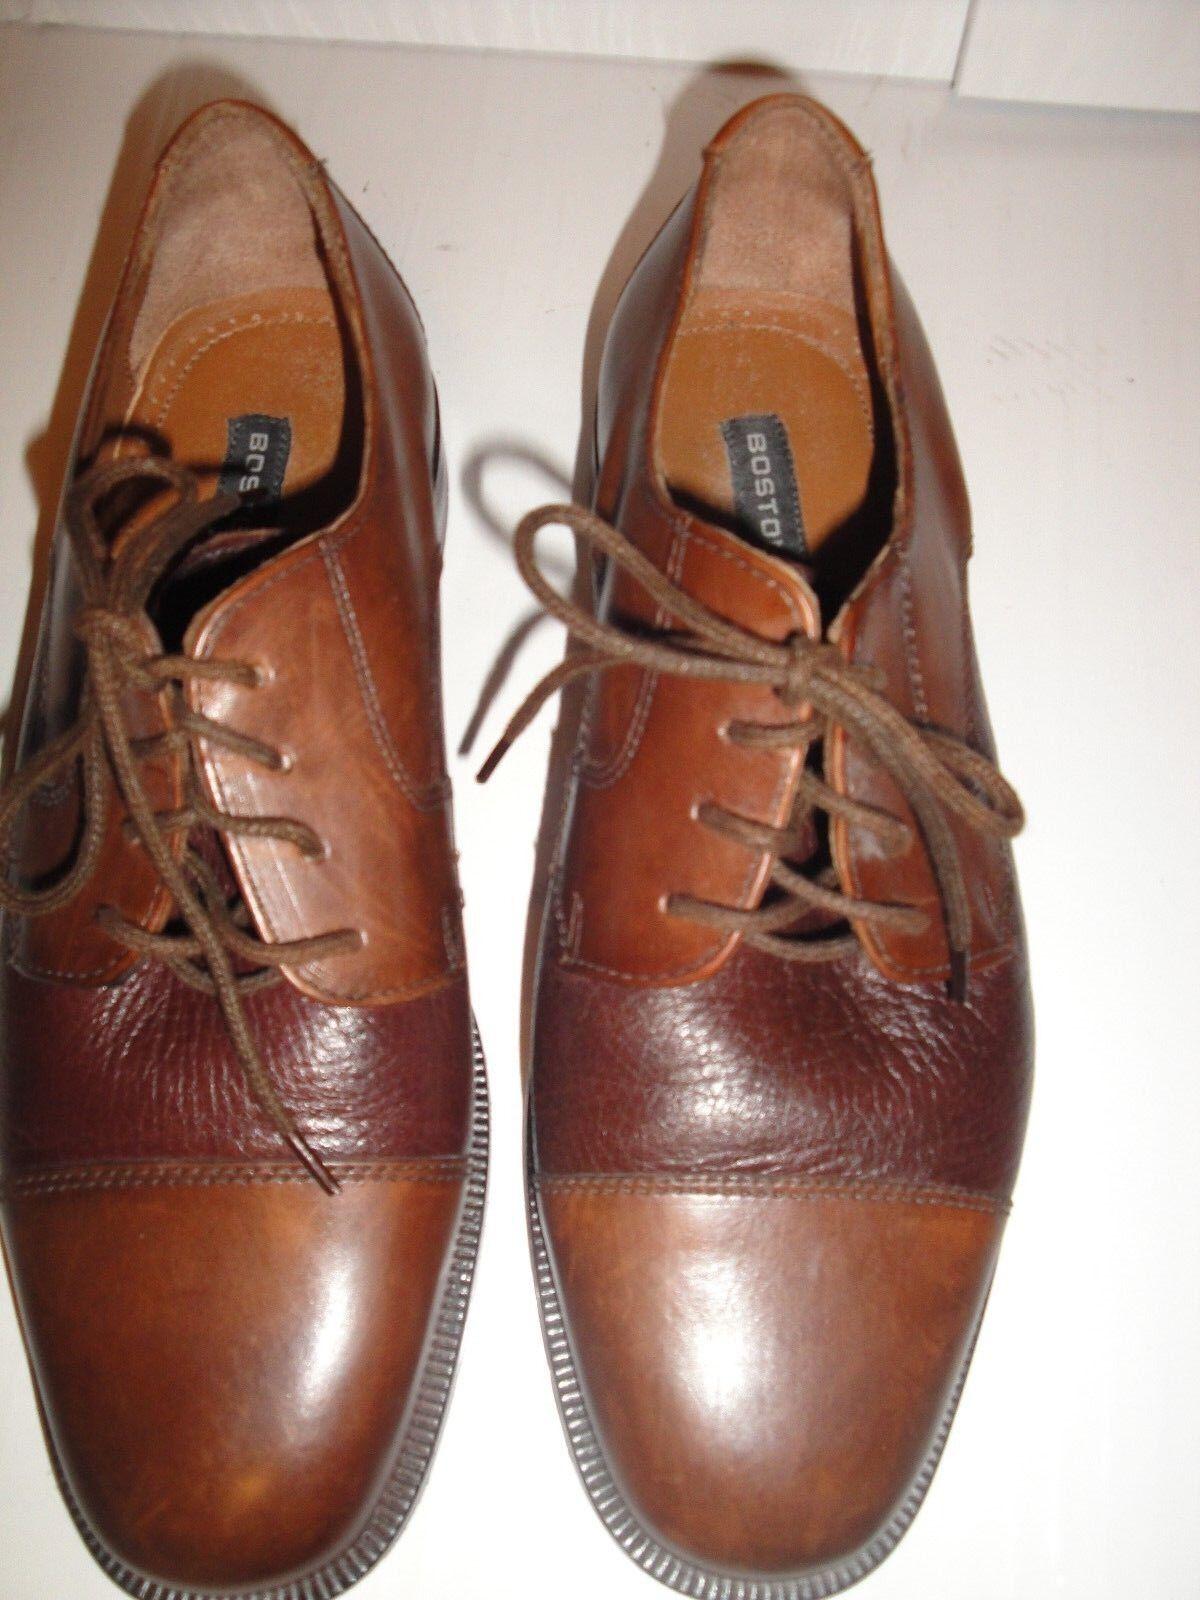 Bostonian Men's Brown Leather Oxfords shoes Size 7M